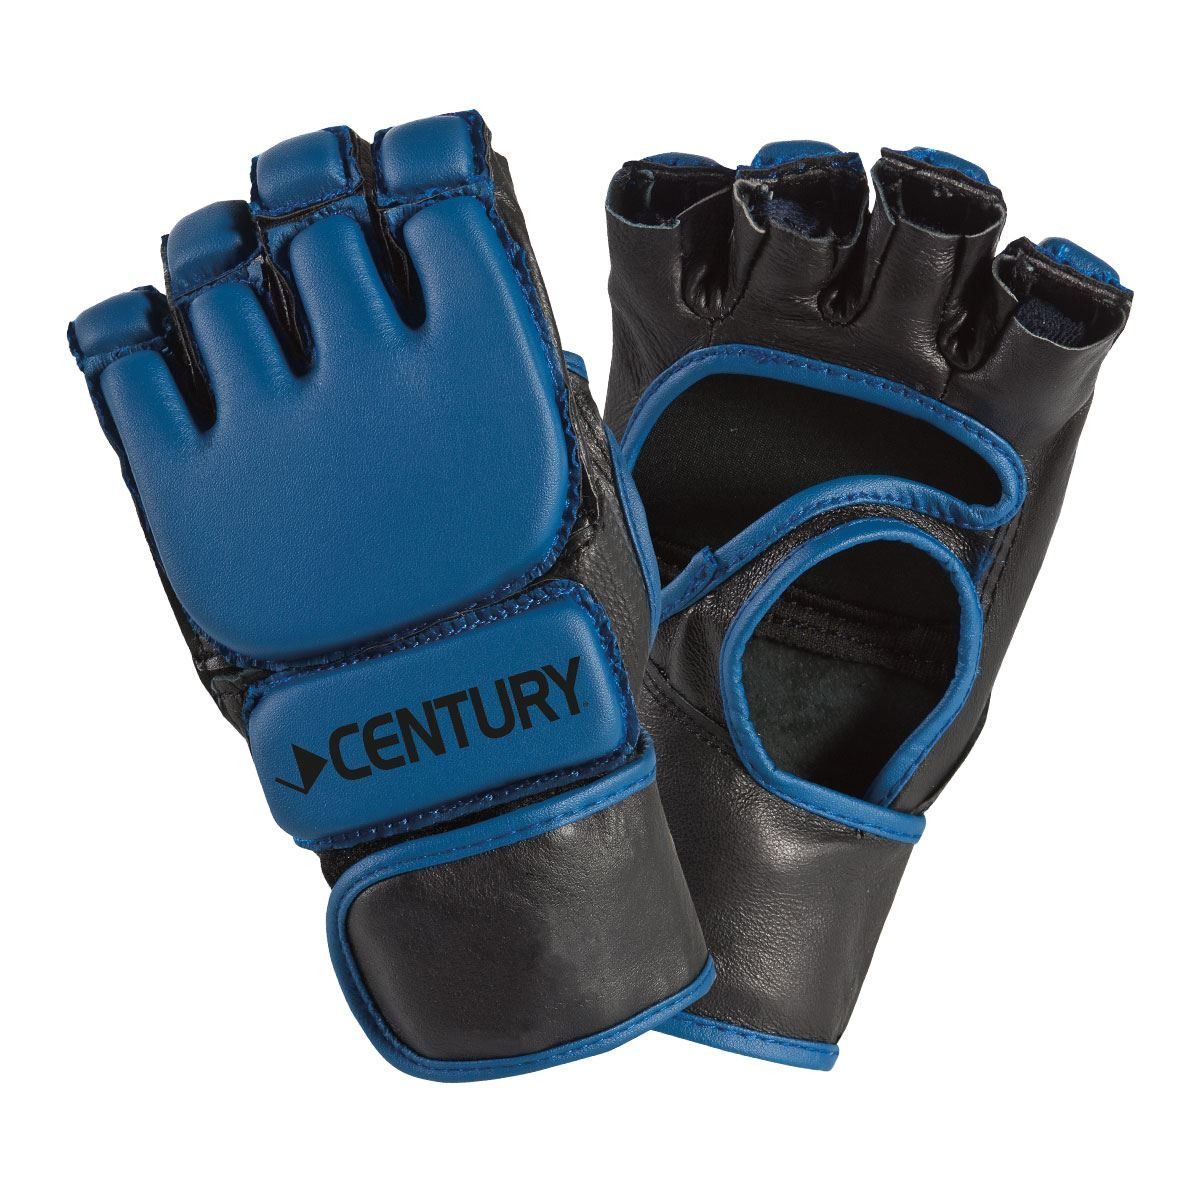 Brave Open Palm Bag Gloves c14991